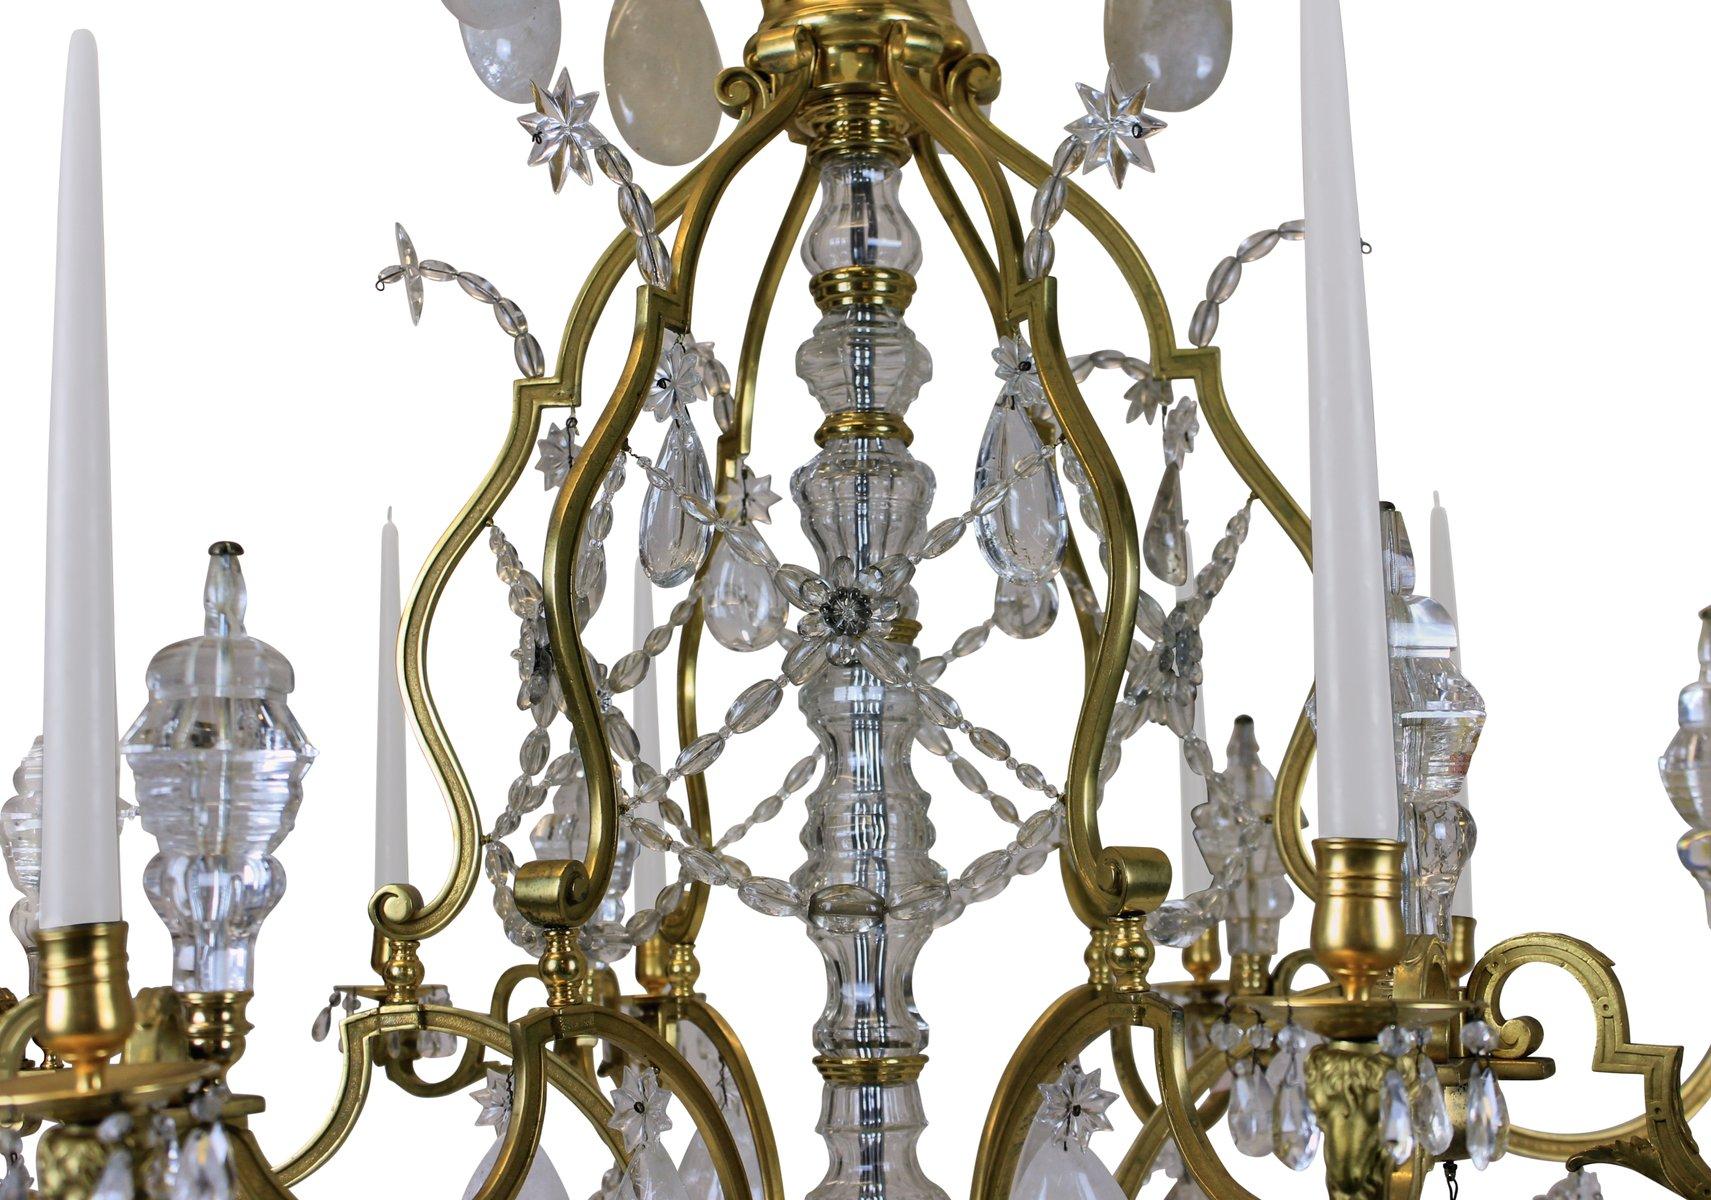 groer antiker ludwig xiv kronleuchter aus vergoldeter bronze bergkristall - Bronze Kronleuchter